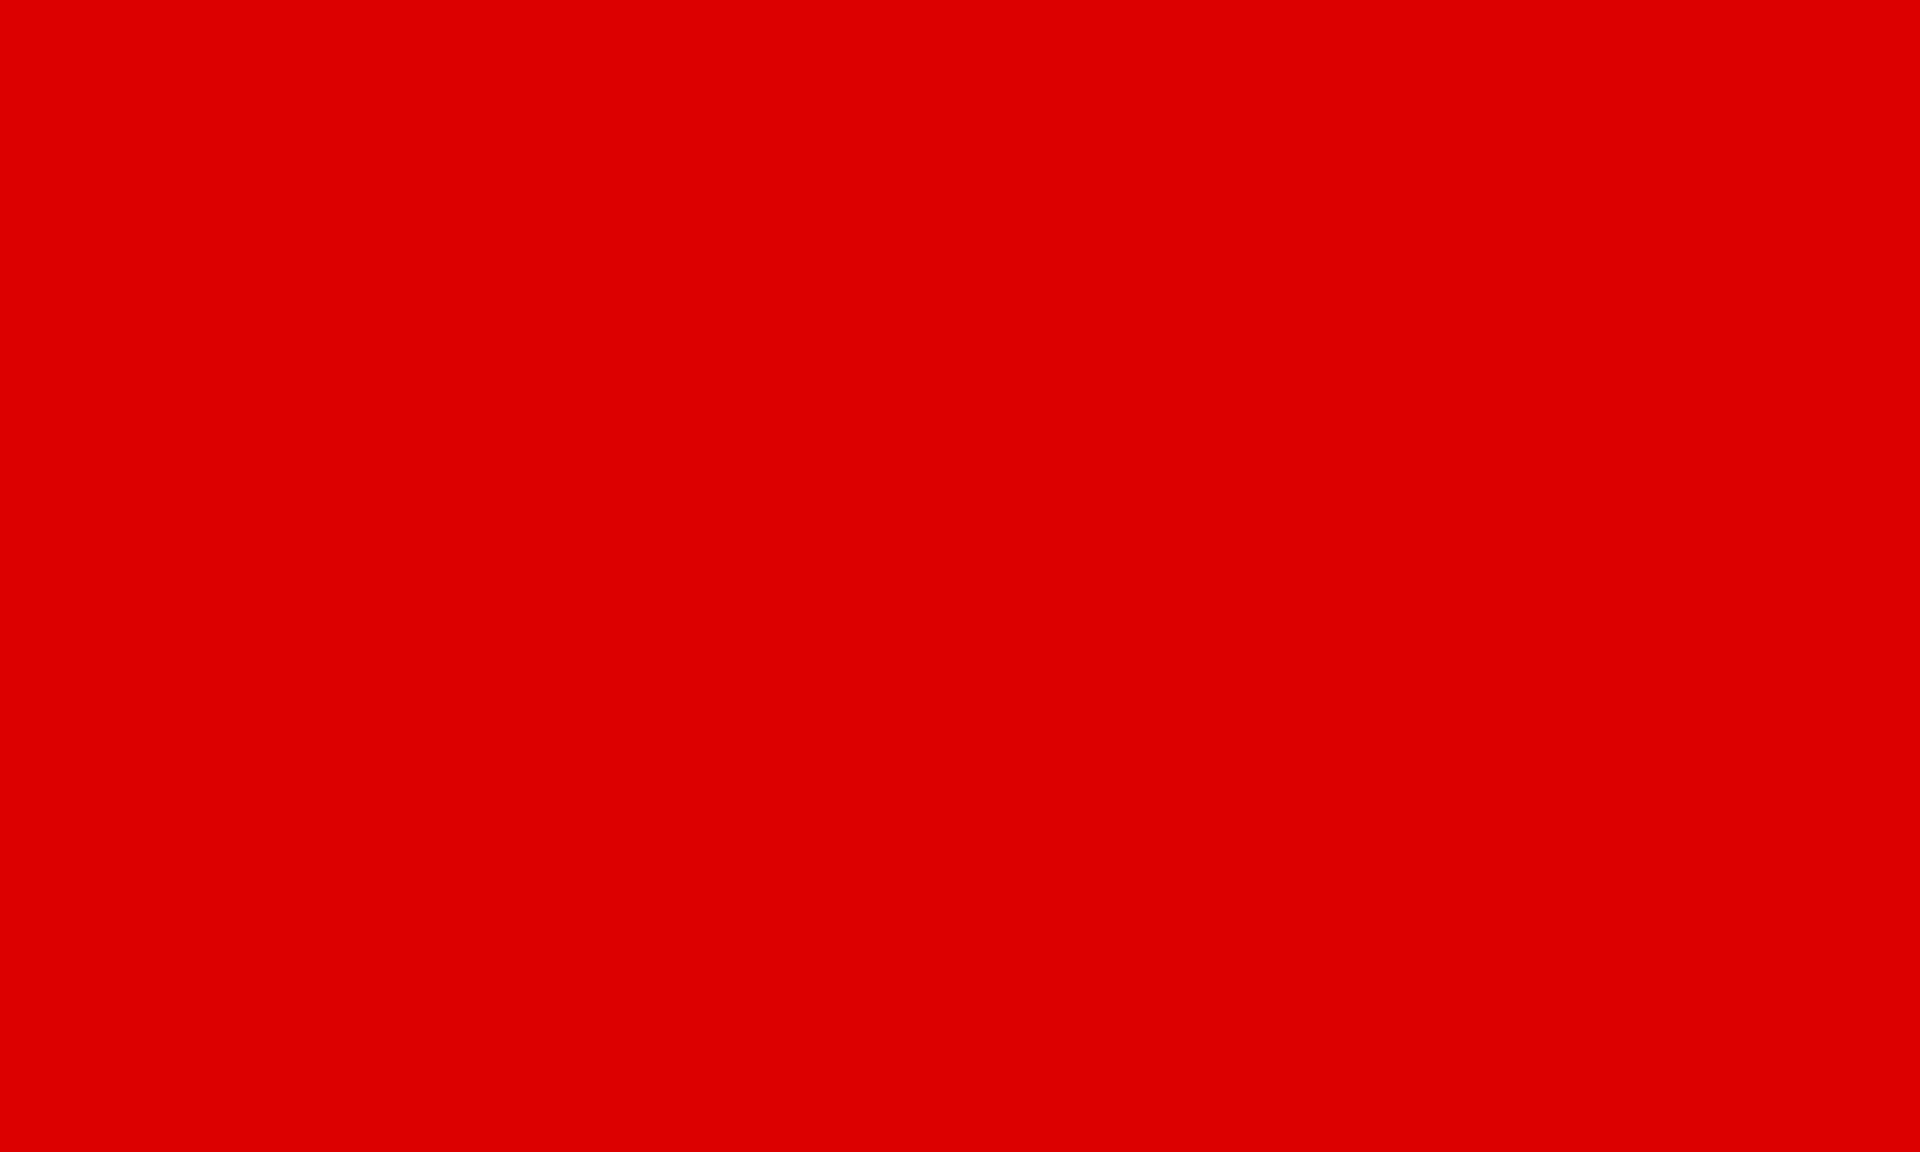 International Socialist Party